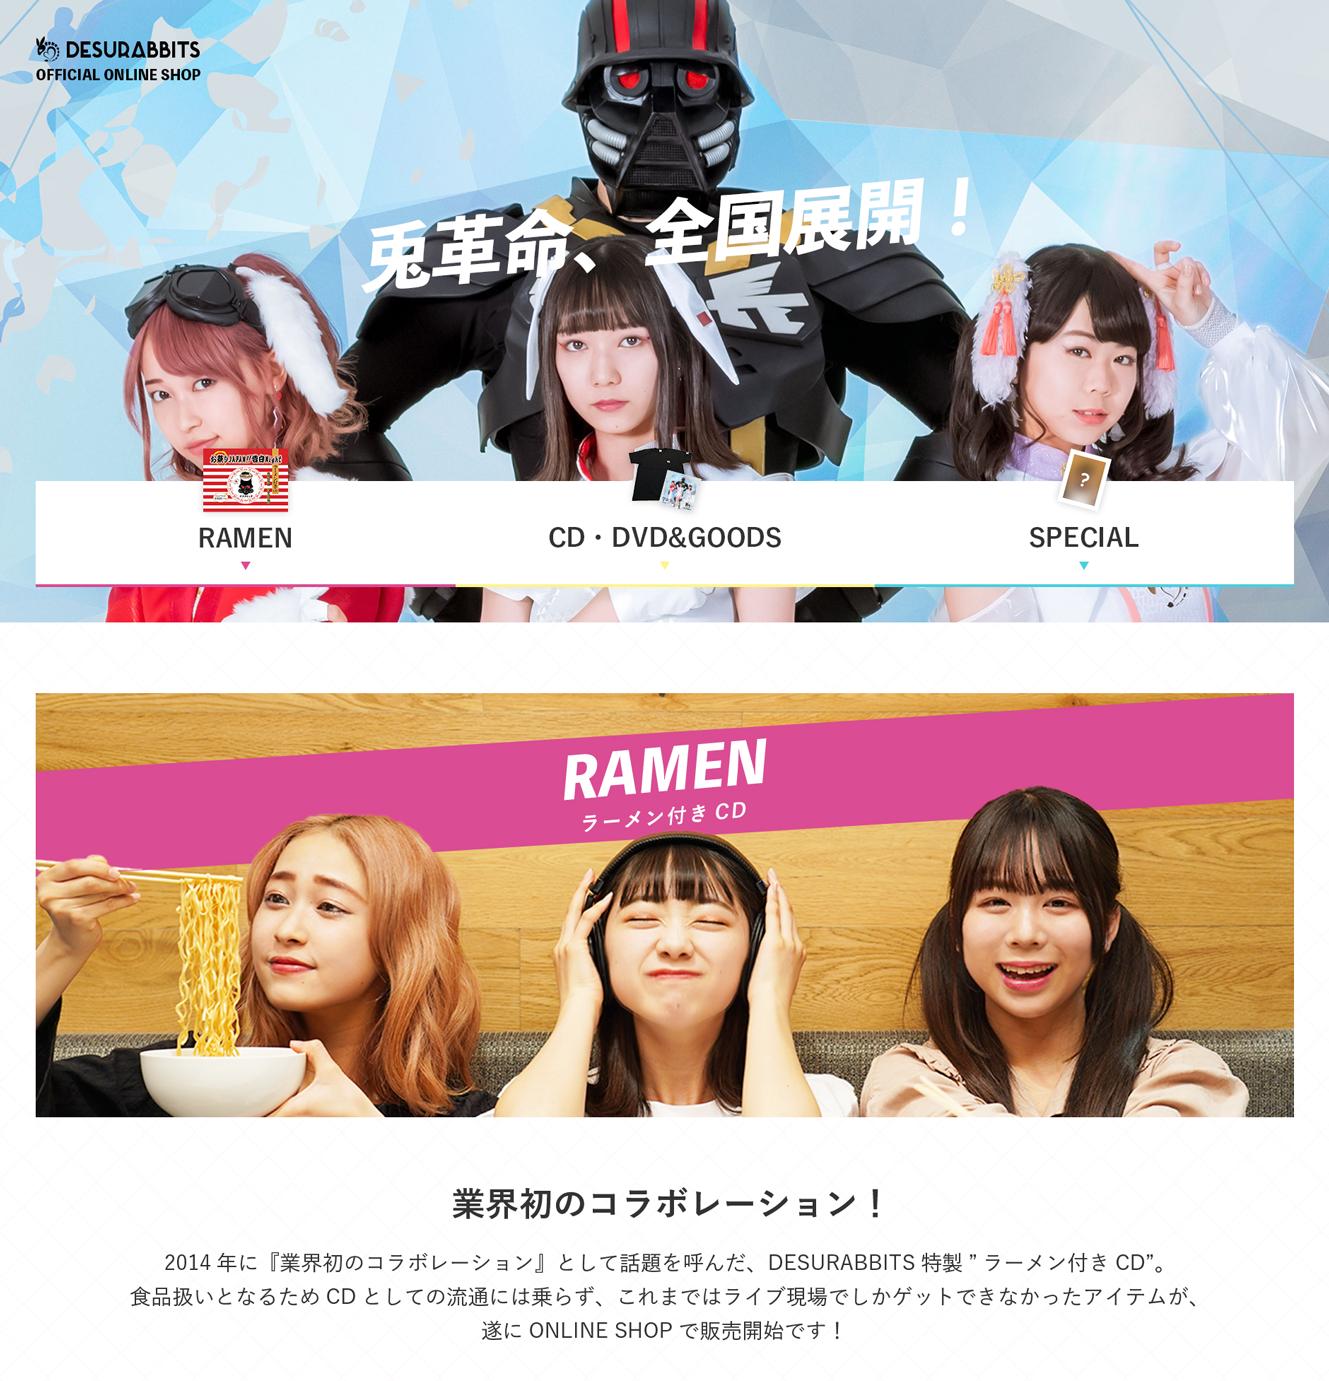 【DESURABBITS】公式オンラインショップがオープンしました【GOODS NEWS】